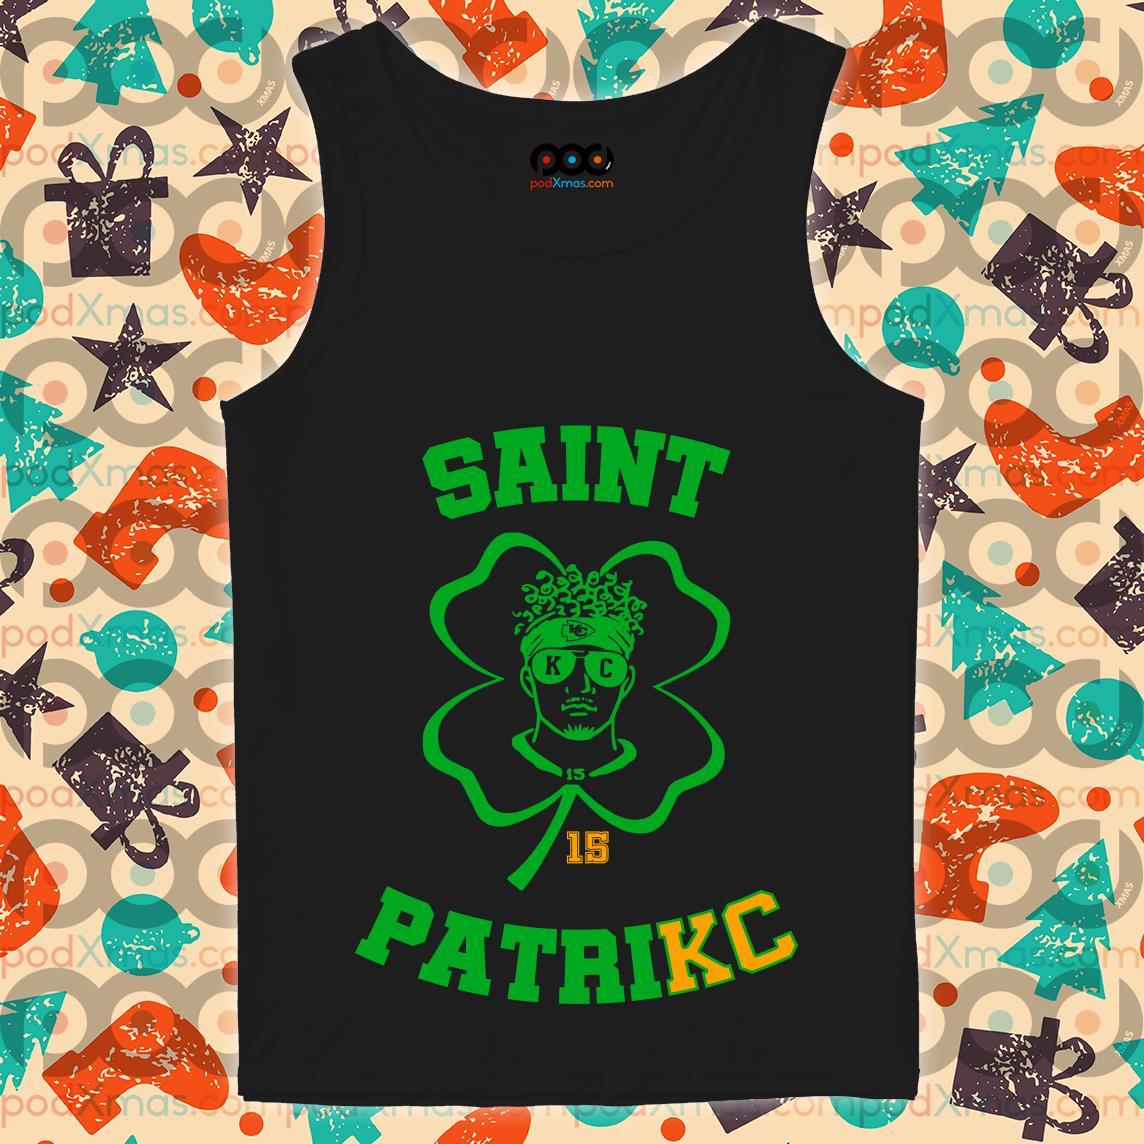 Mahomes St Patrick's Day Saint PatriKC funny tank top